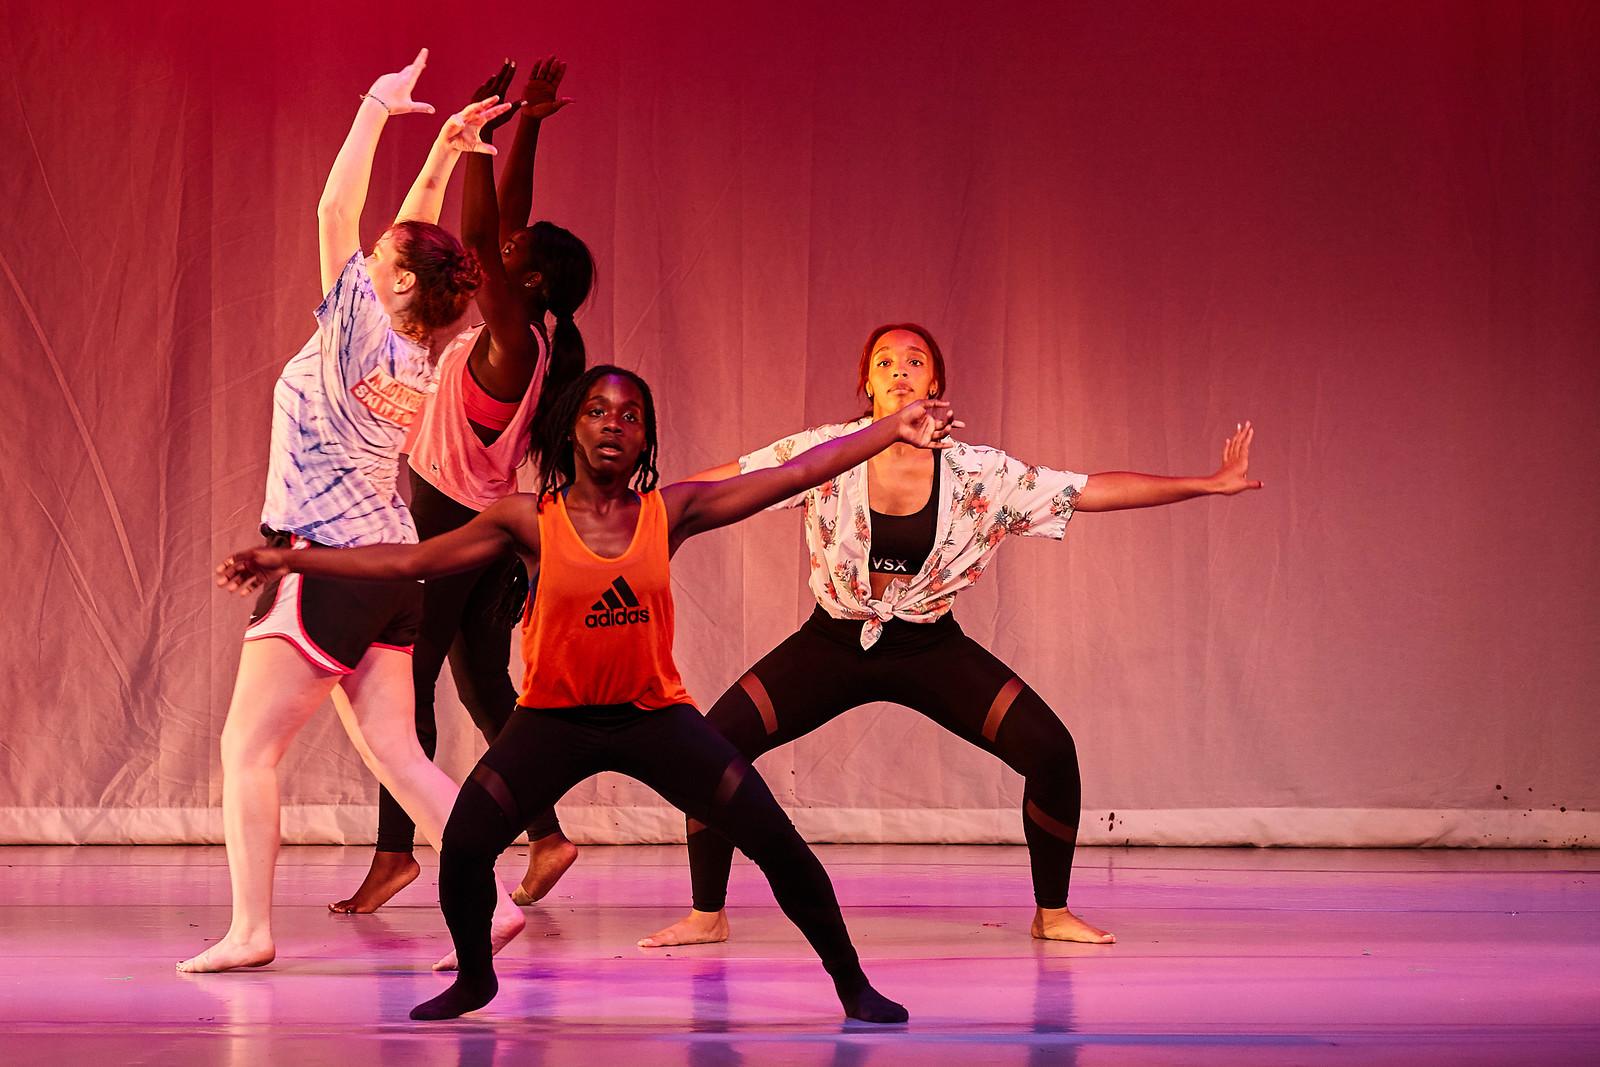 Mayfair dance - May 17, 2017- 42943-X3.jpg